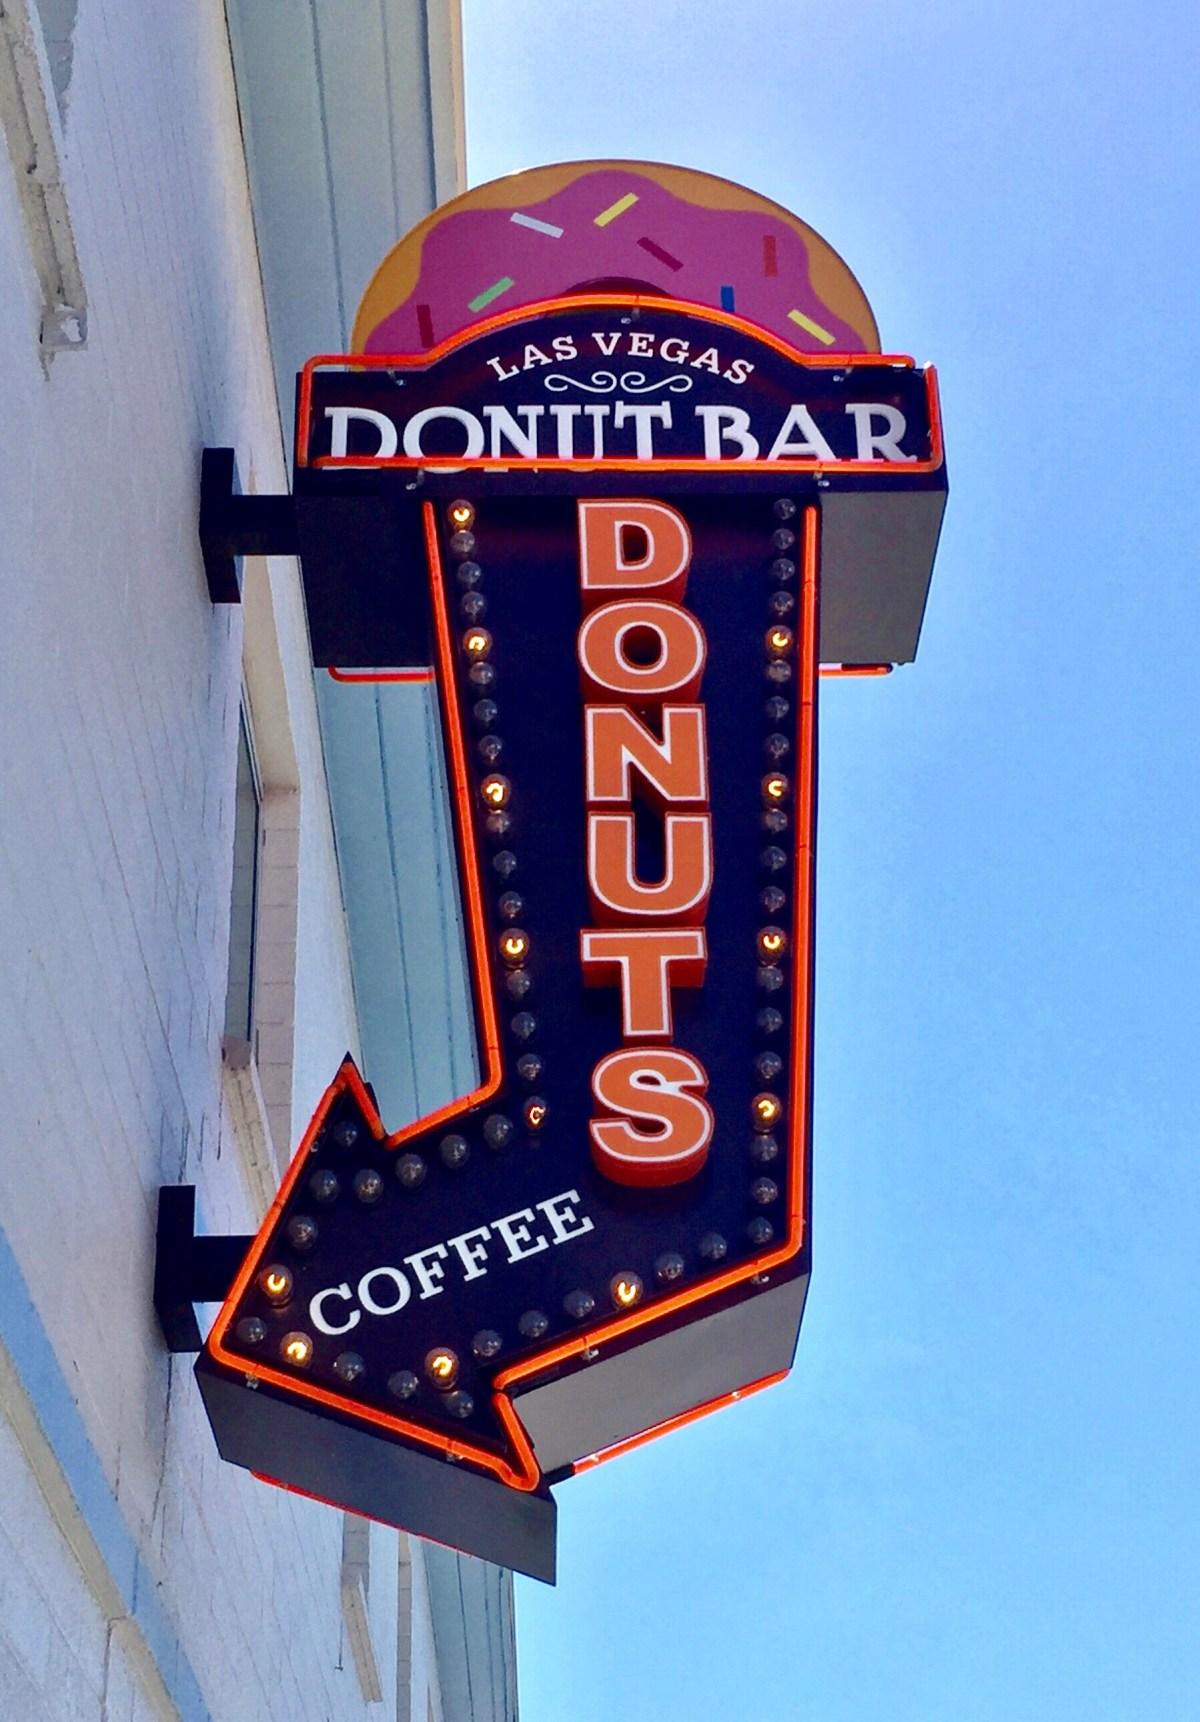 Donut Bar | Downtown Las Vegas #donutbar #donuts #vegas #lasvegas #downtownlasvegas